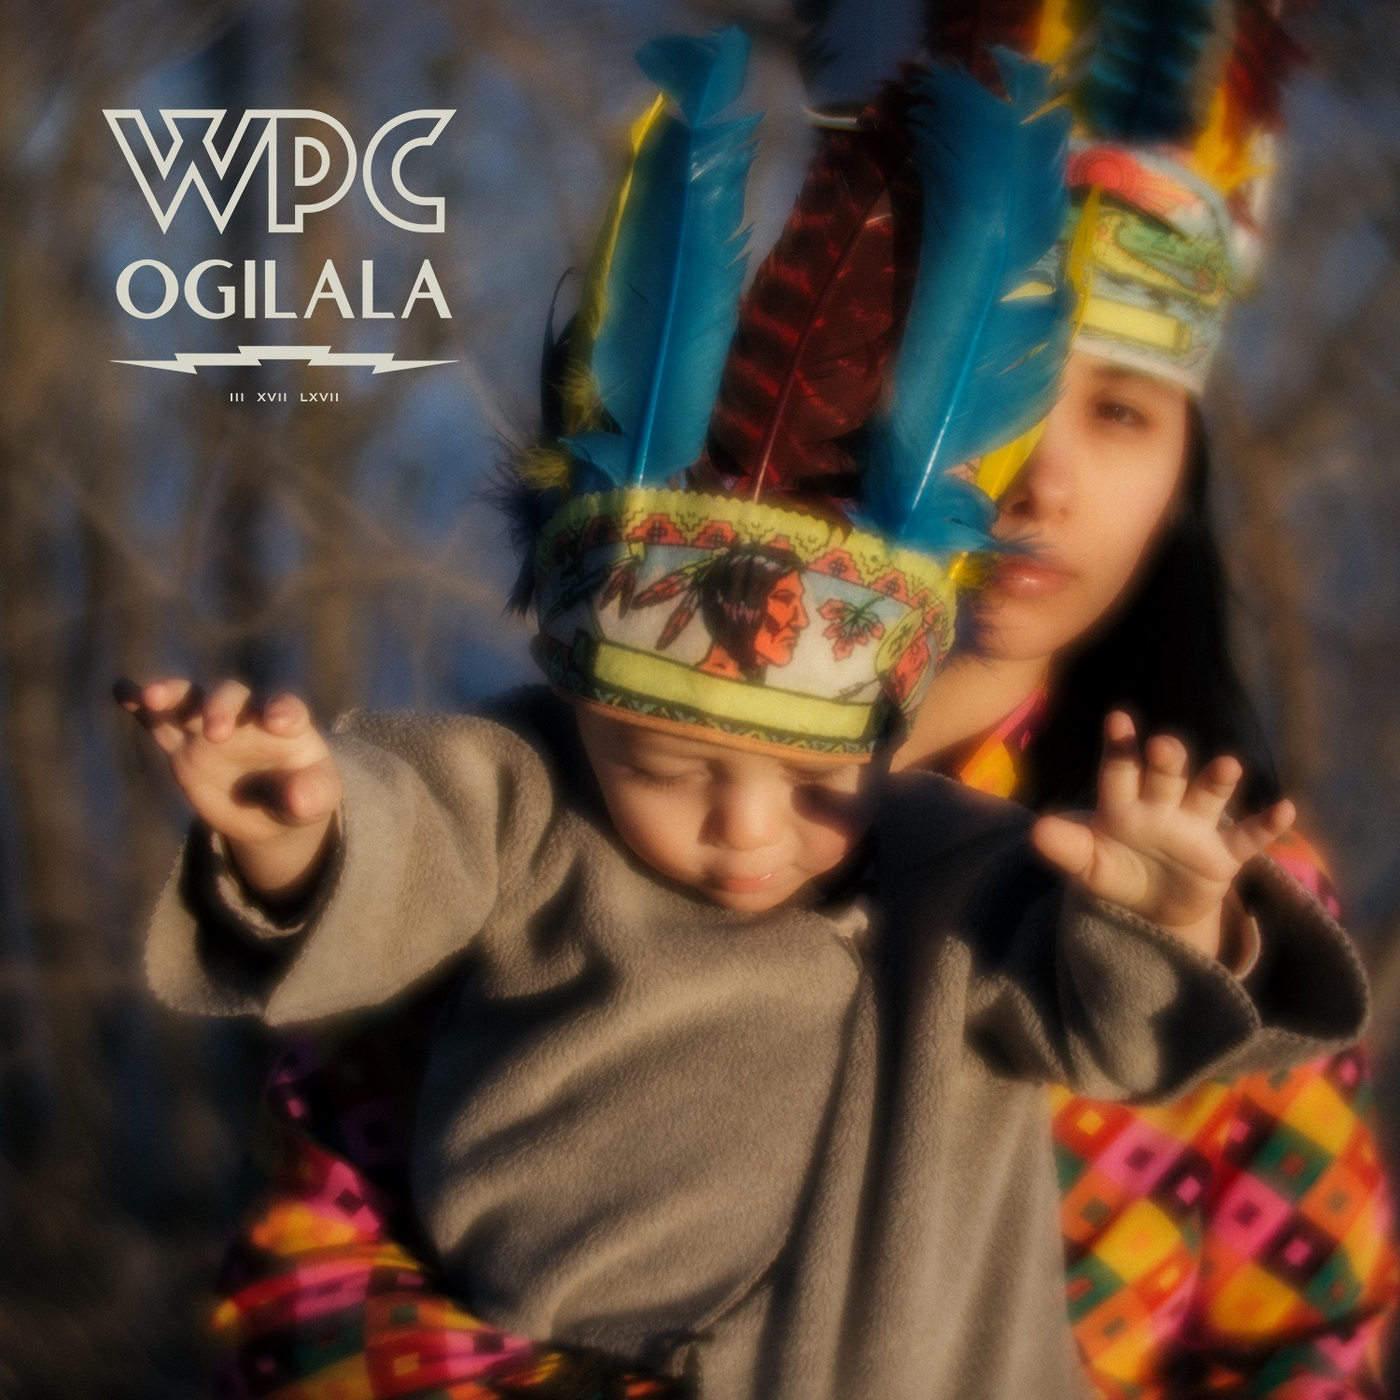 William Patrick Corgan: Ogilala (2017) Book Cover